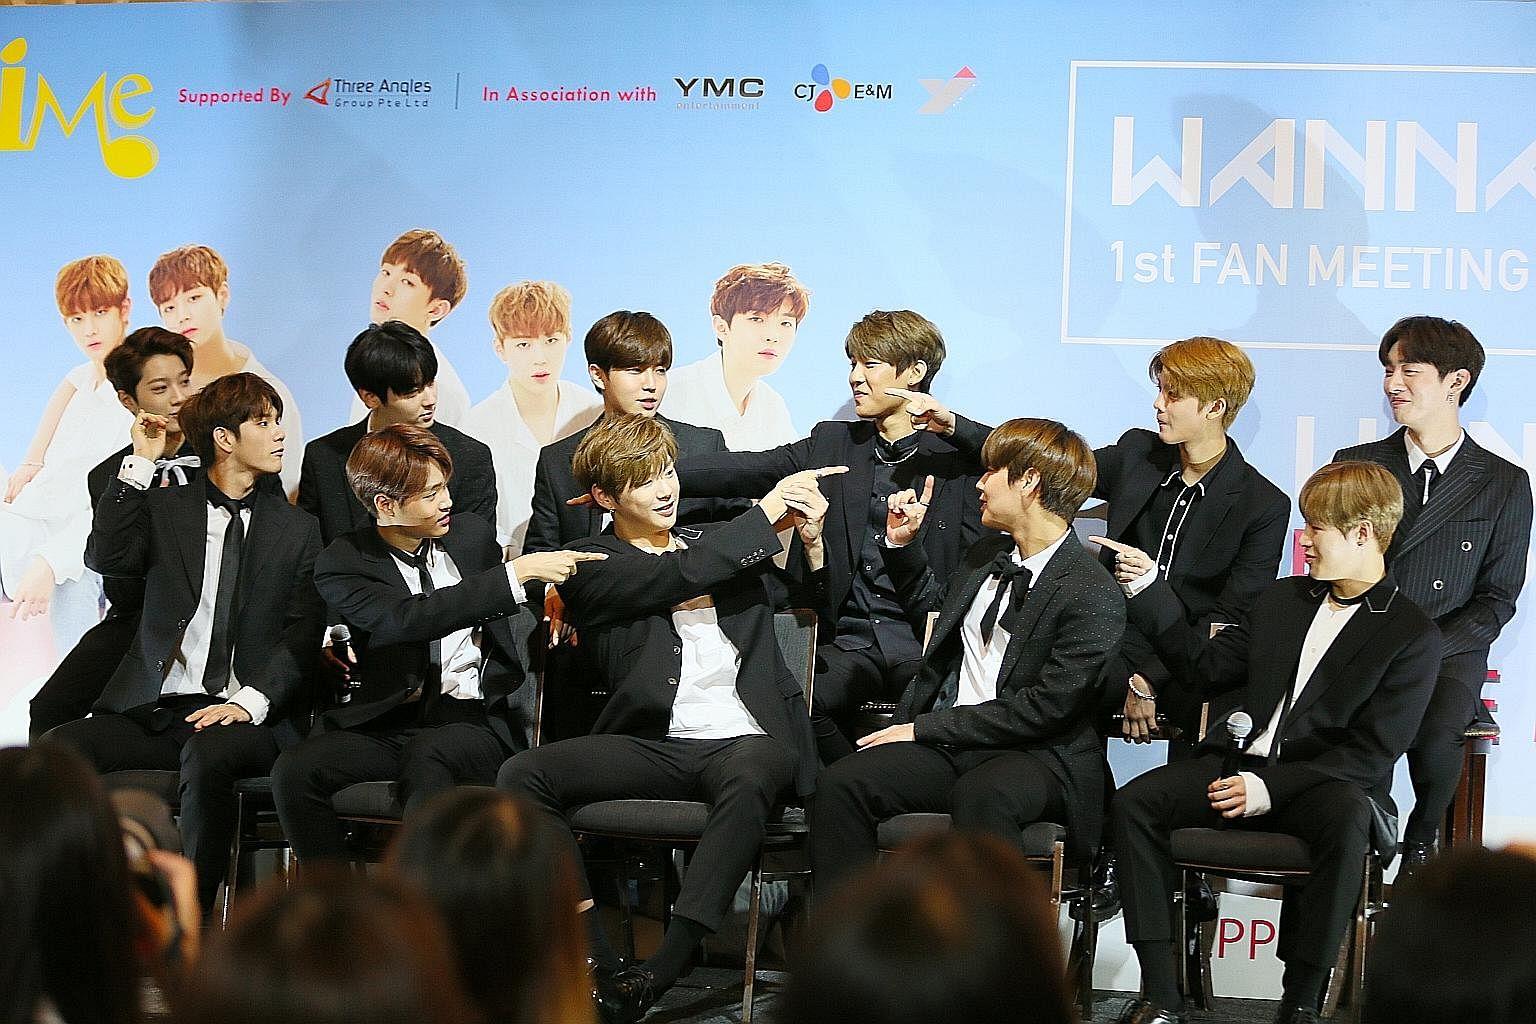 Wanna One are made up of (back row, from left) Lai Guan Lin, 16, Hwang Min Hyun, 22, Kim Jae Hwan, 21, Park Woo Jin, 17, Bae Jin Young, 17, Yoon Ji Sung, 26, and (front row, from left) Ong Seong Wu, 22, Lee Dae Hwi, 16, Kang Daniel, 20, Park Ji Hoon,